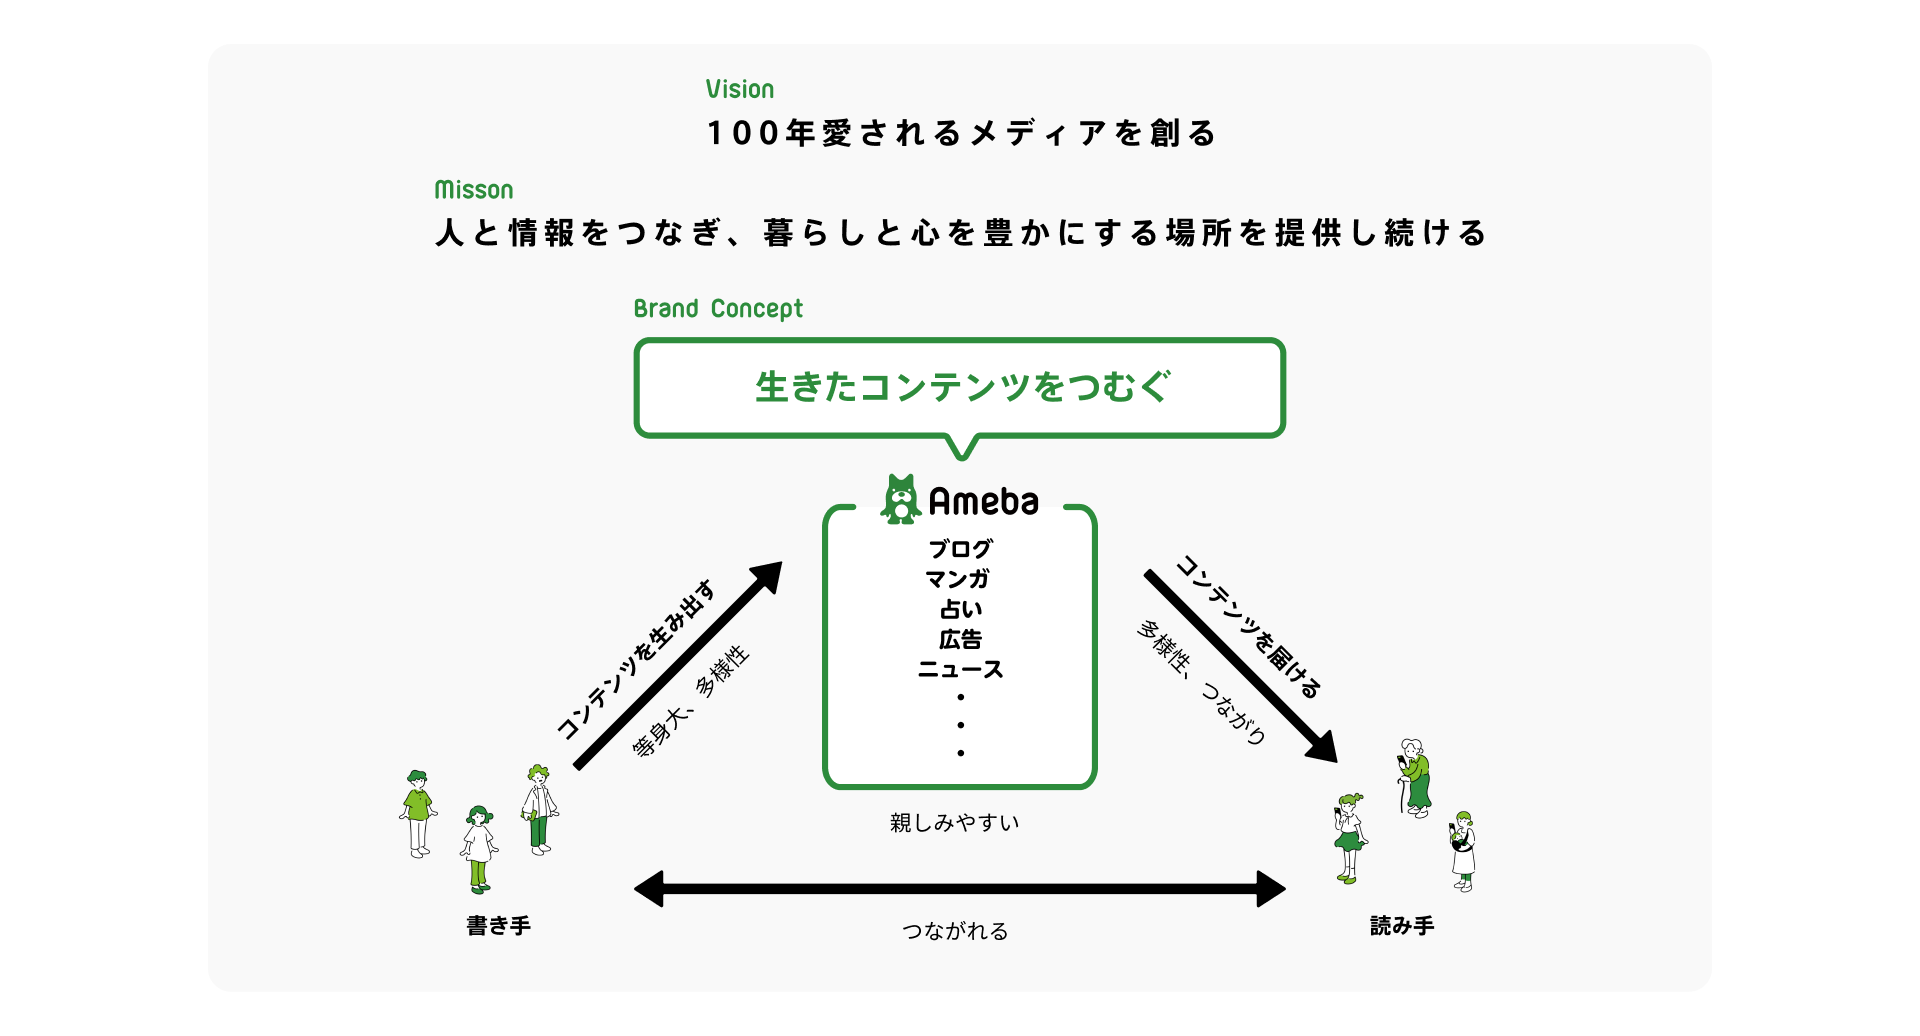 Amebaのビジョンとミッション、ブランドコンセプト「生きたコンテンツをつむぐ」。サービス利用者とコンテンツが繋がり、紡がれていくブランドの実現イメージ図